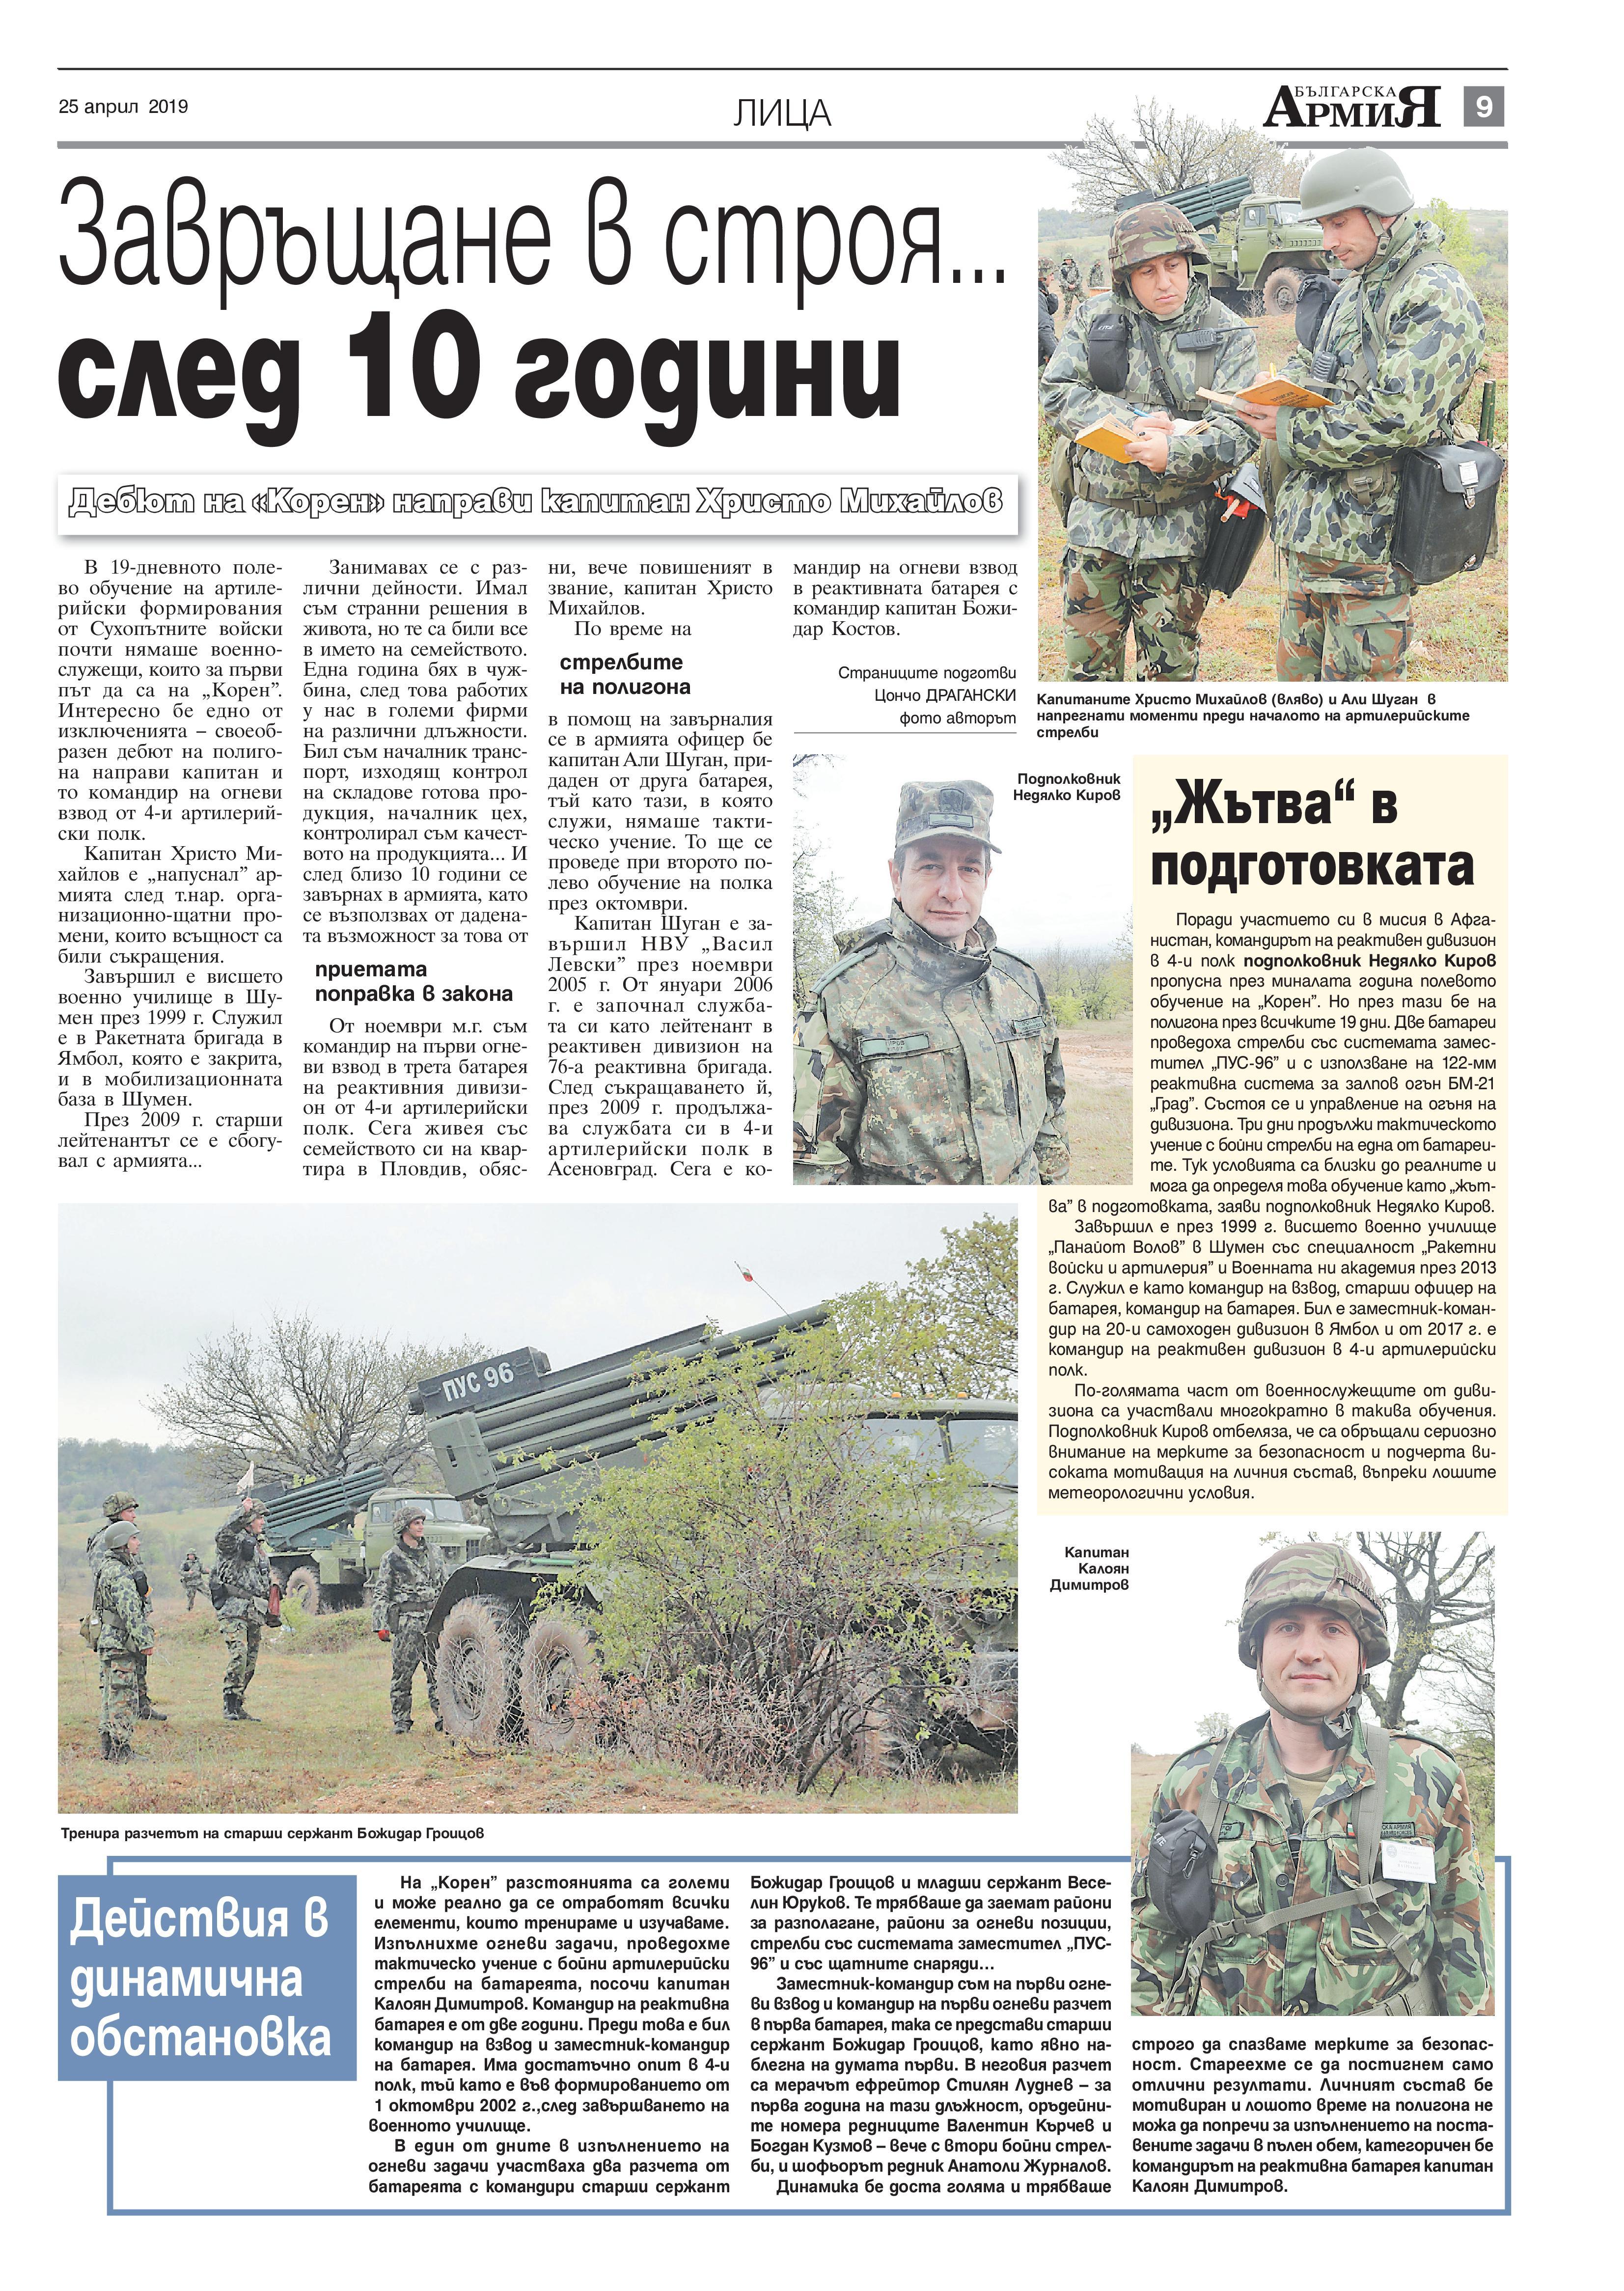 https://armymedia.bg/wp-content/uploads/2015/06/09-27.jpg